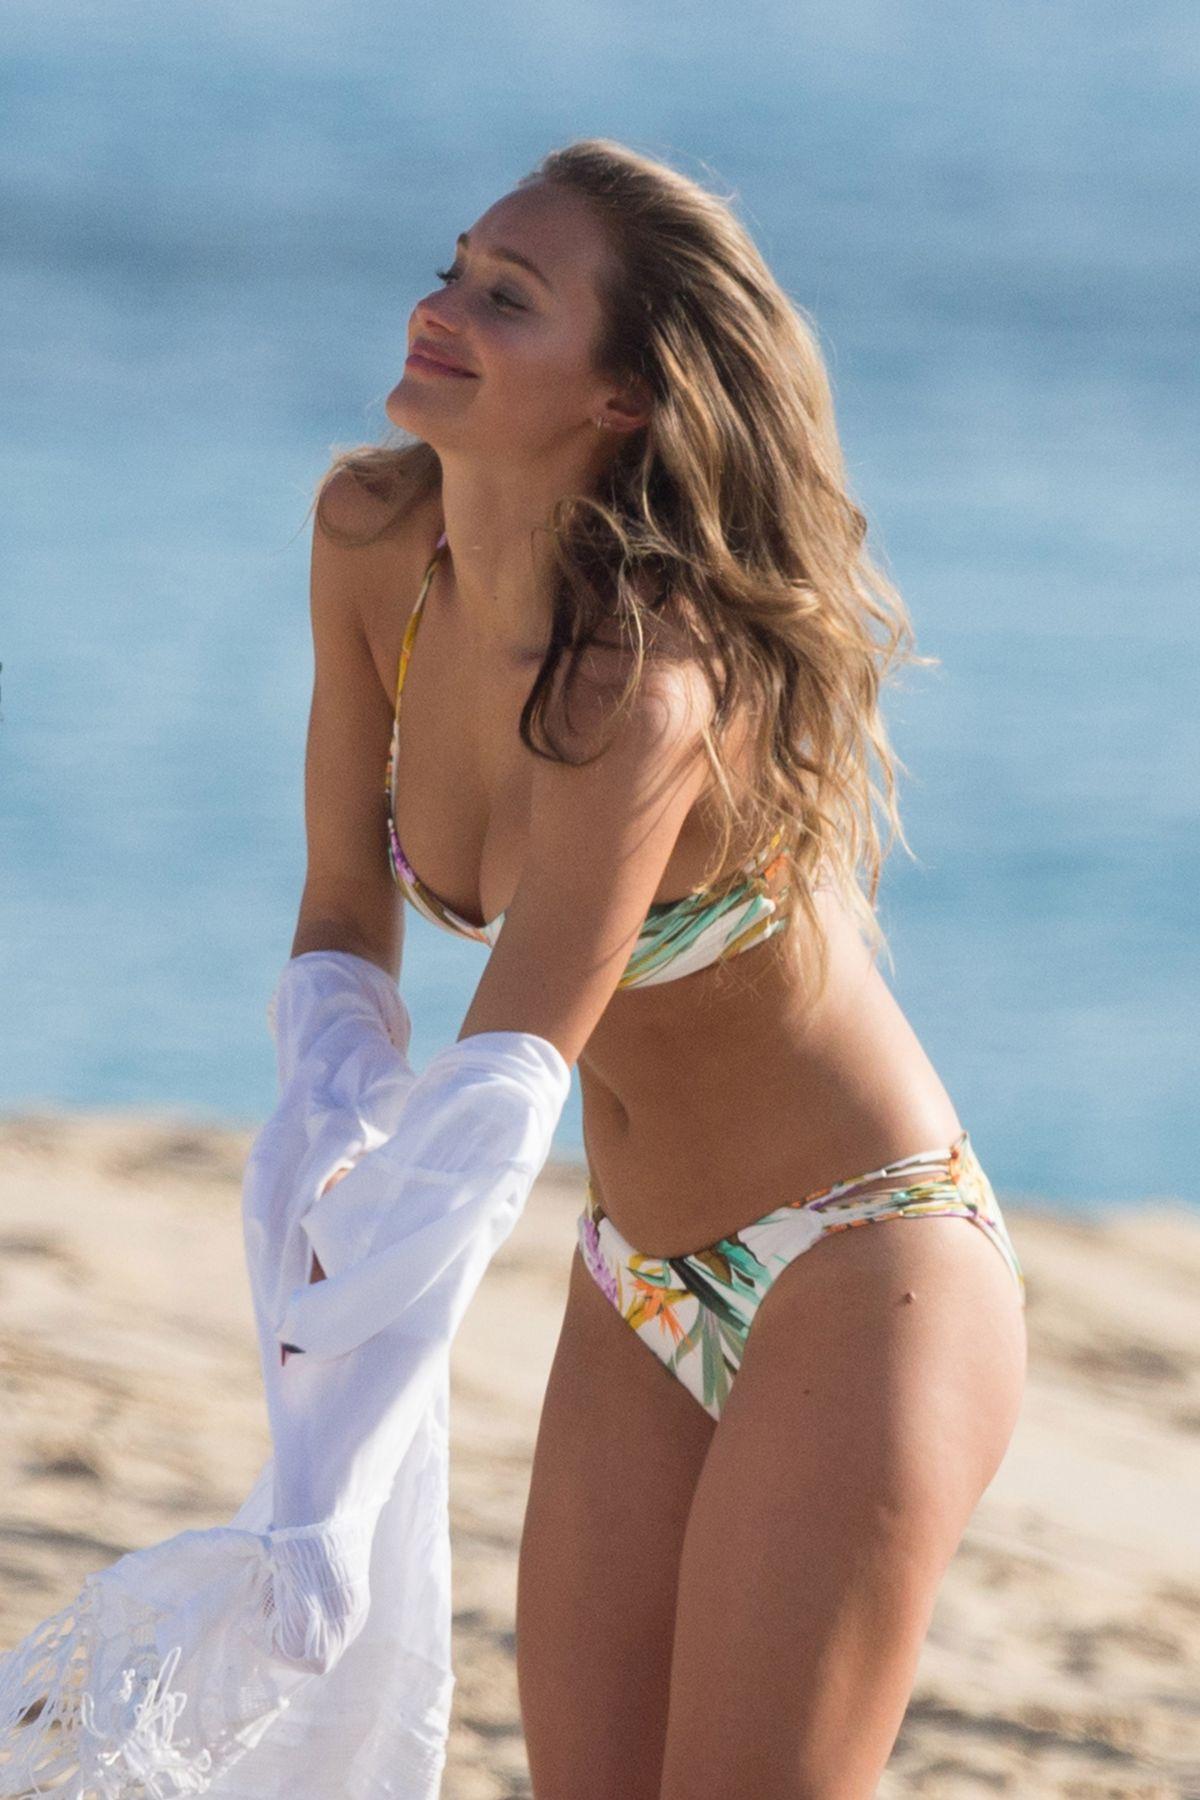 Bikini Hannah Davis nude (23 photos), Topless, Cleavage, Feet, bra 2006